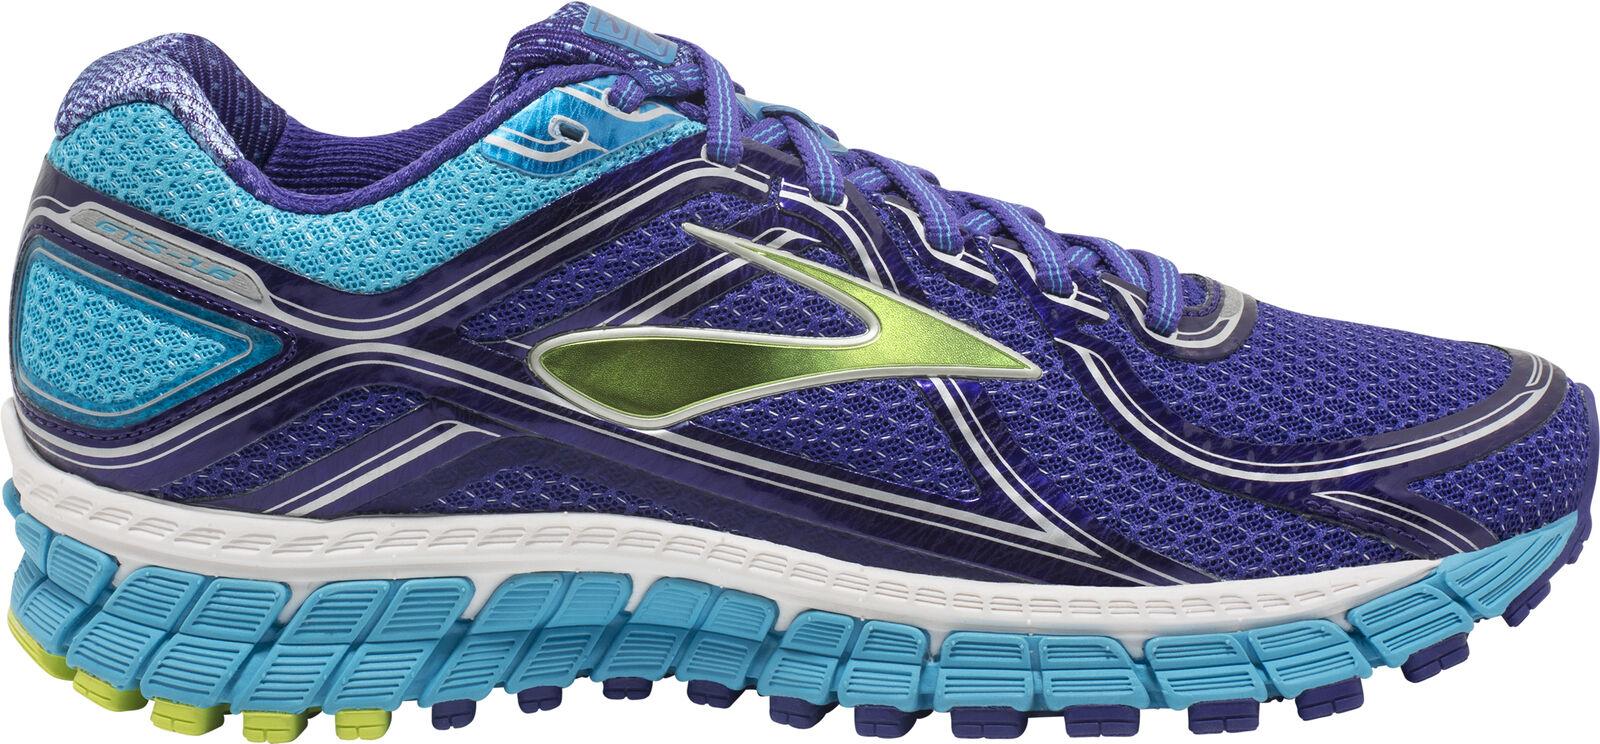 Brooks Adrenaline GTS 16 Womens Running shoes - bluee